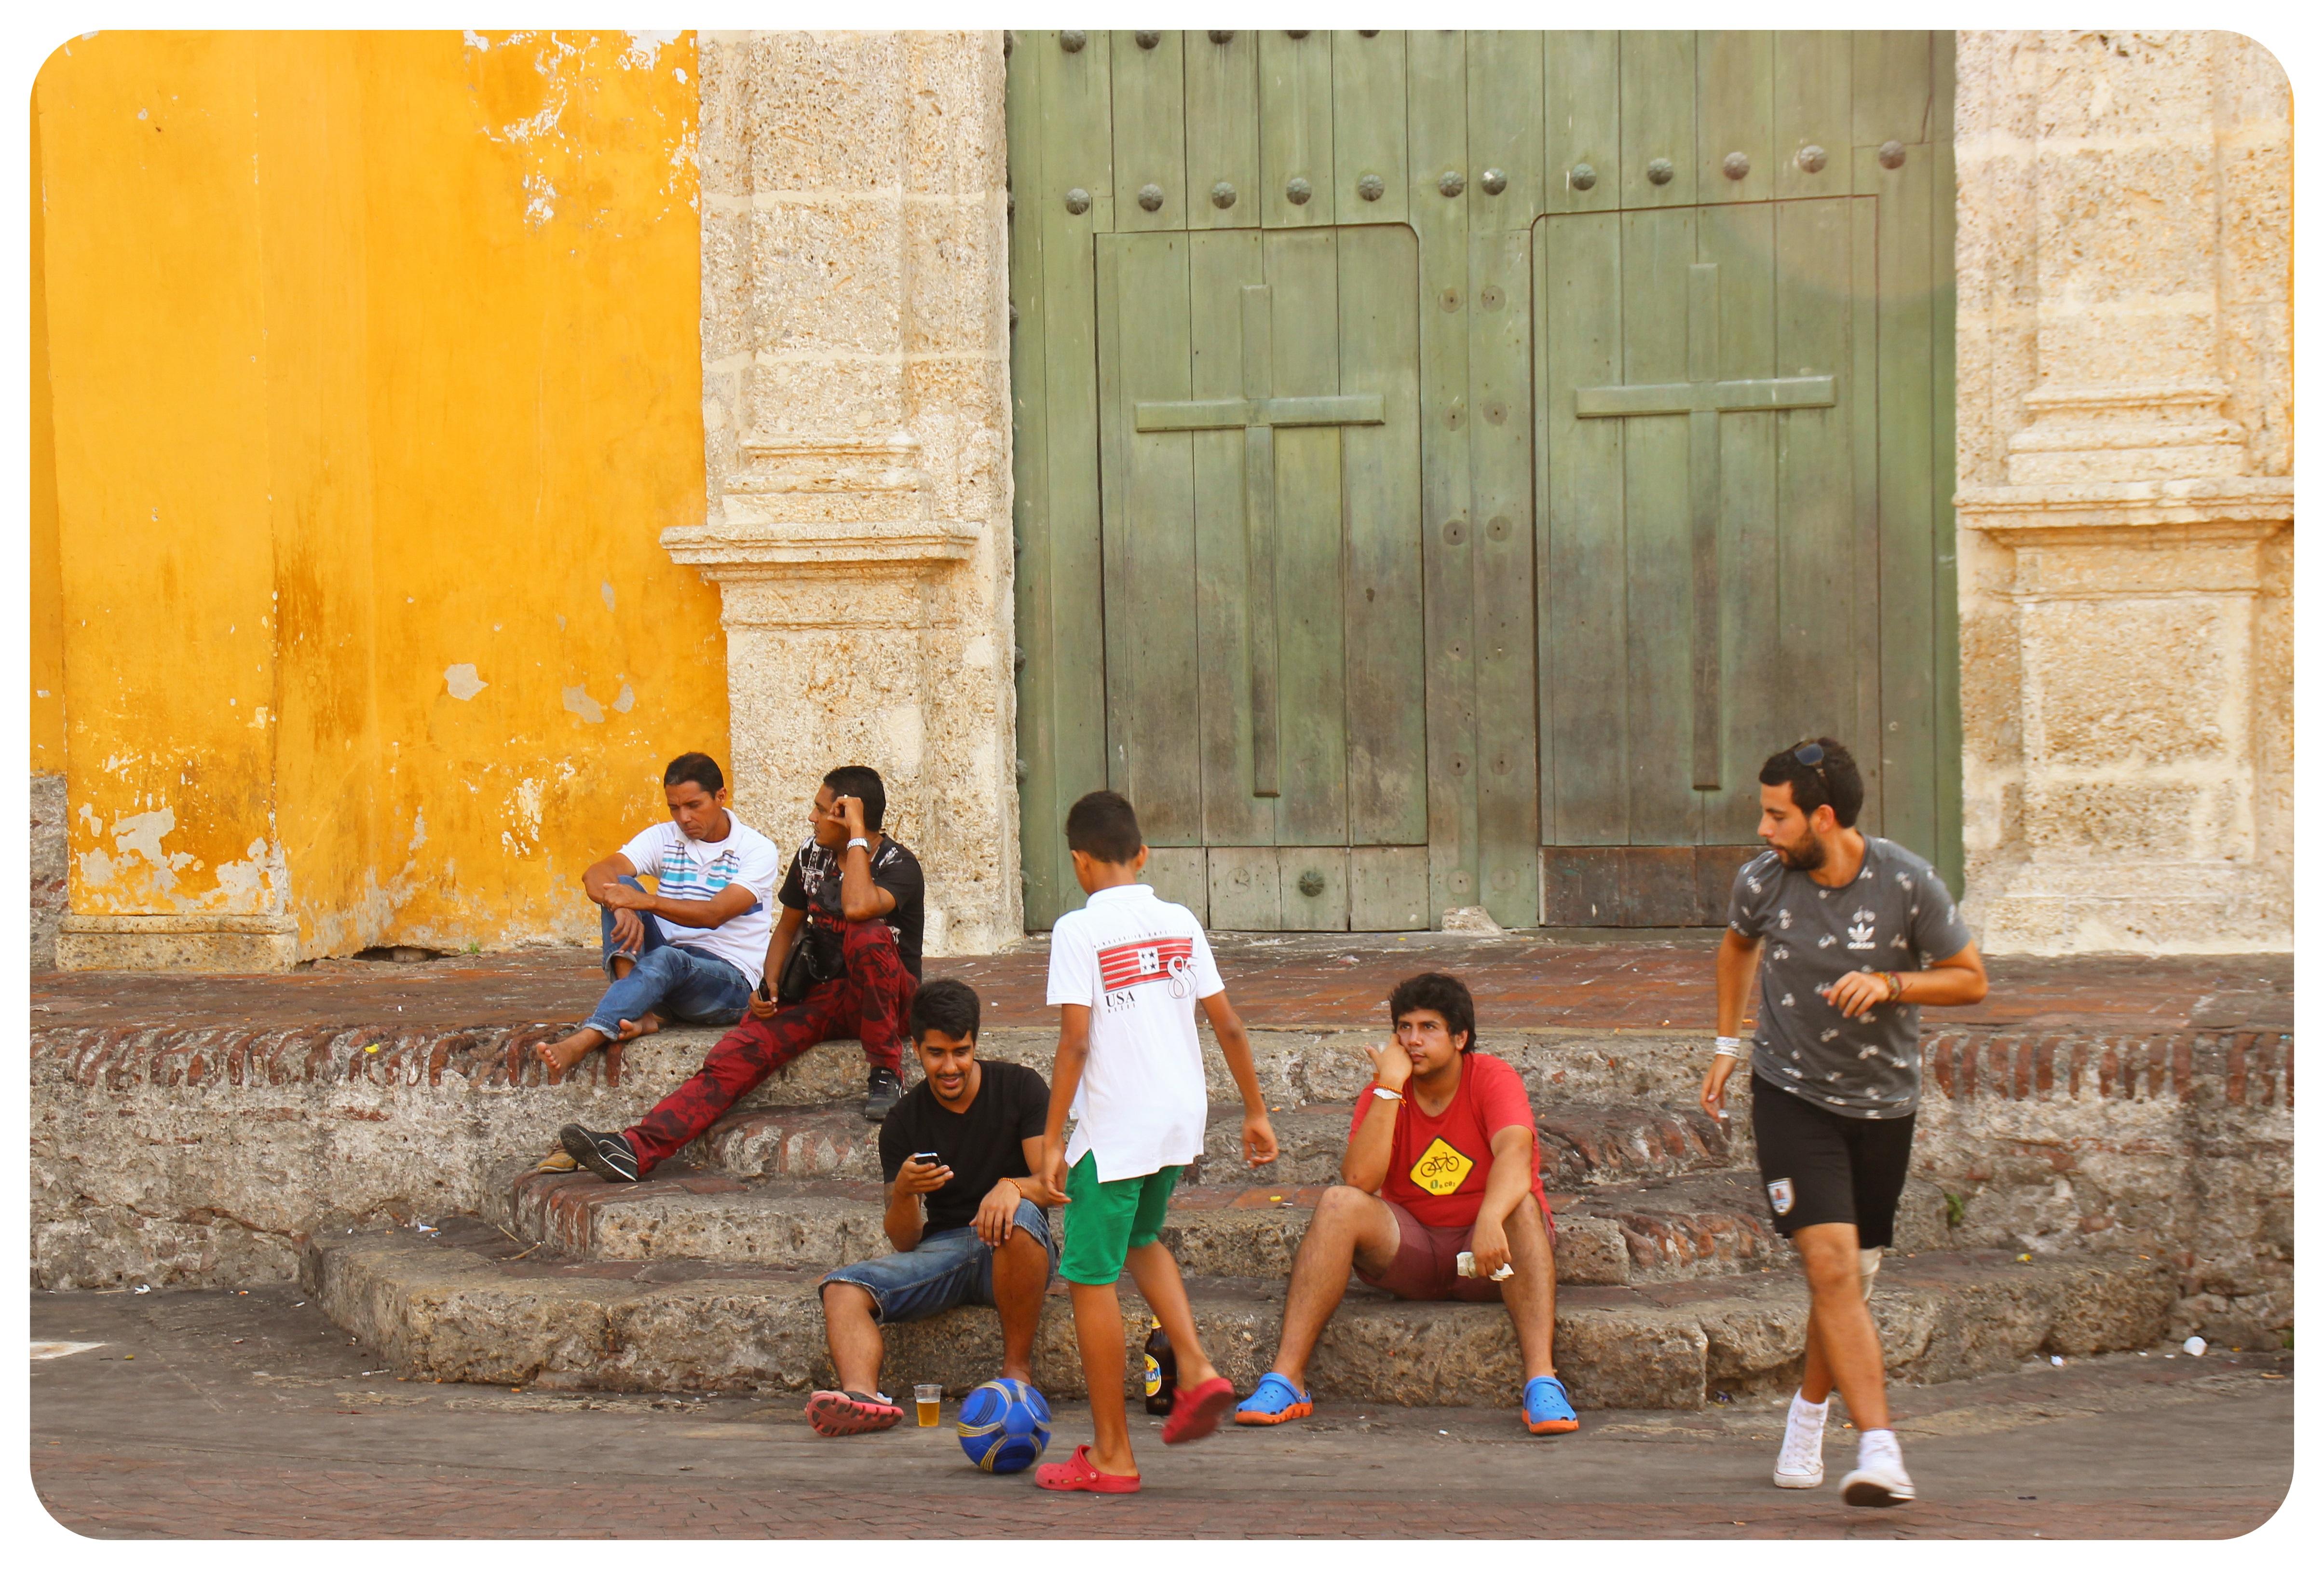 cartagena getsemani boys